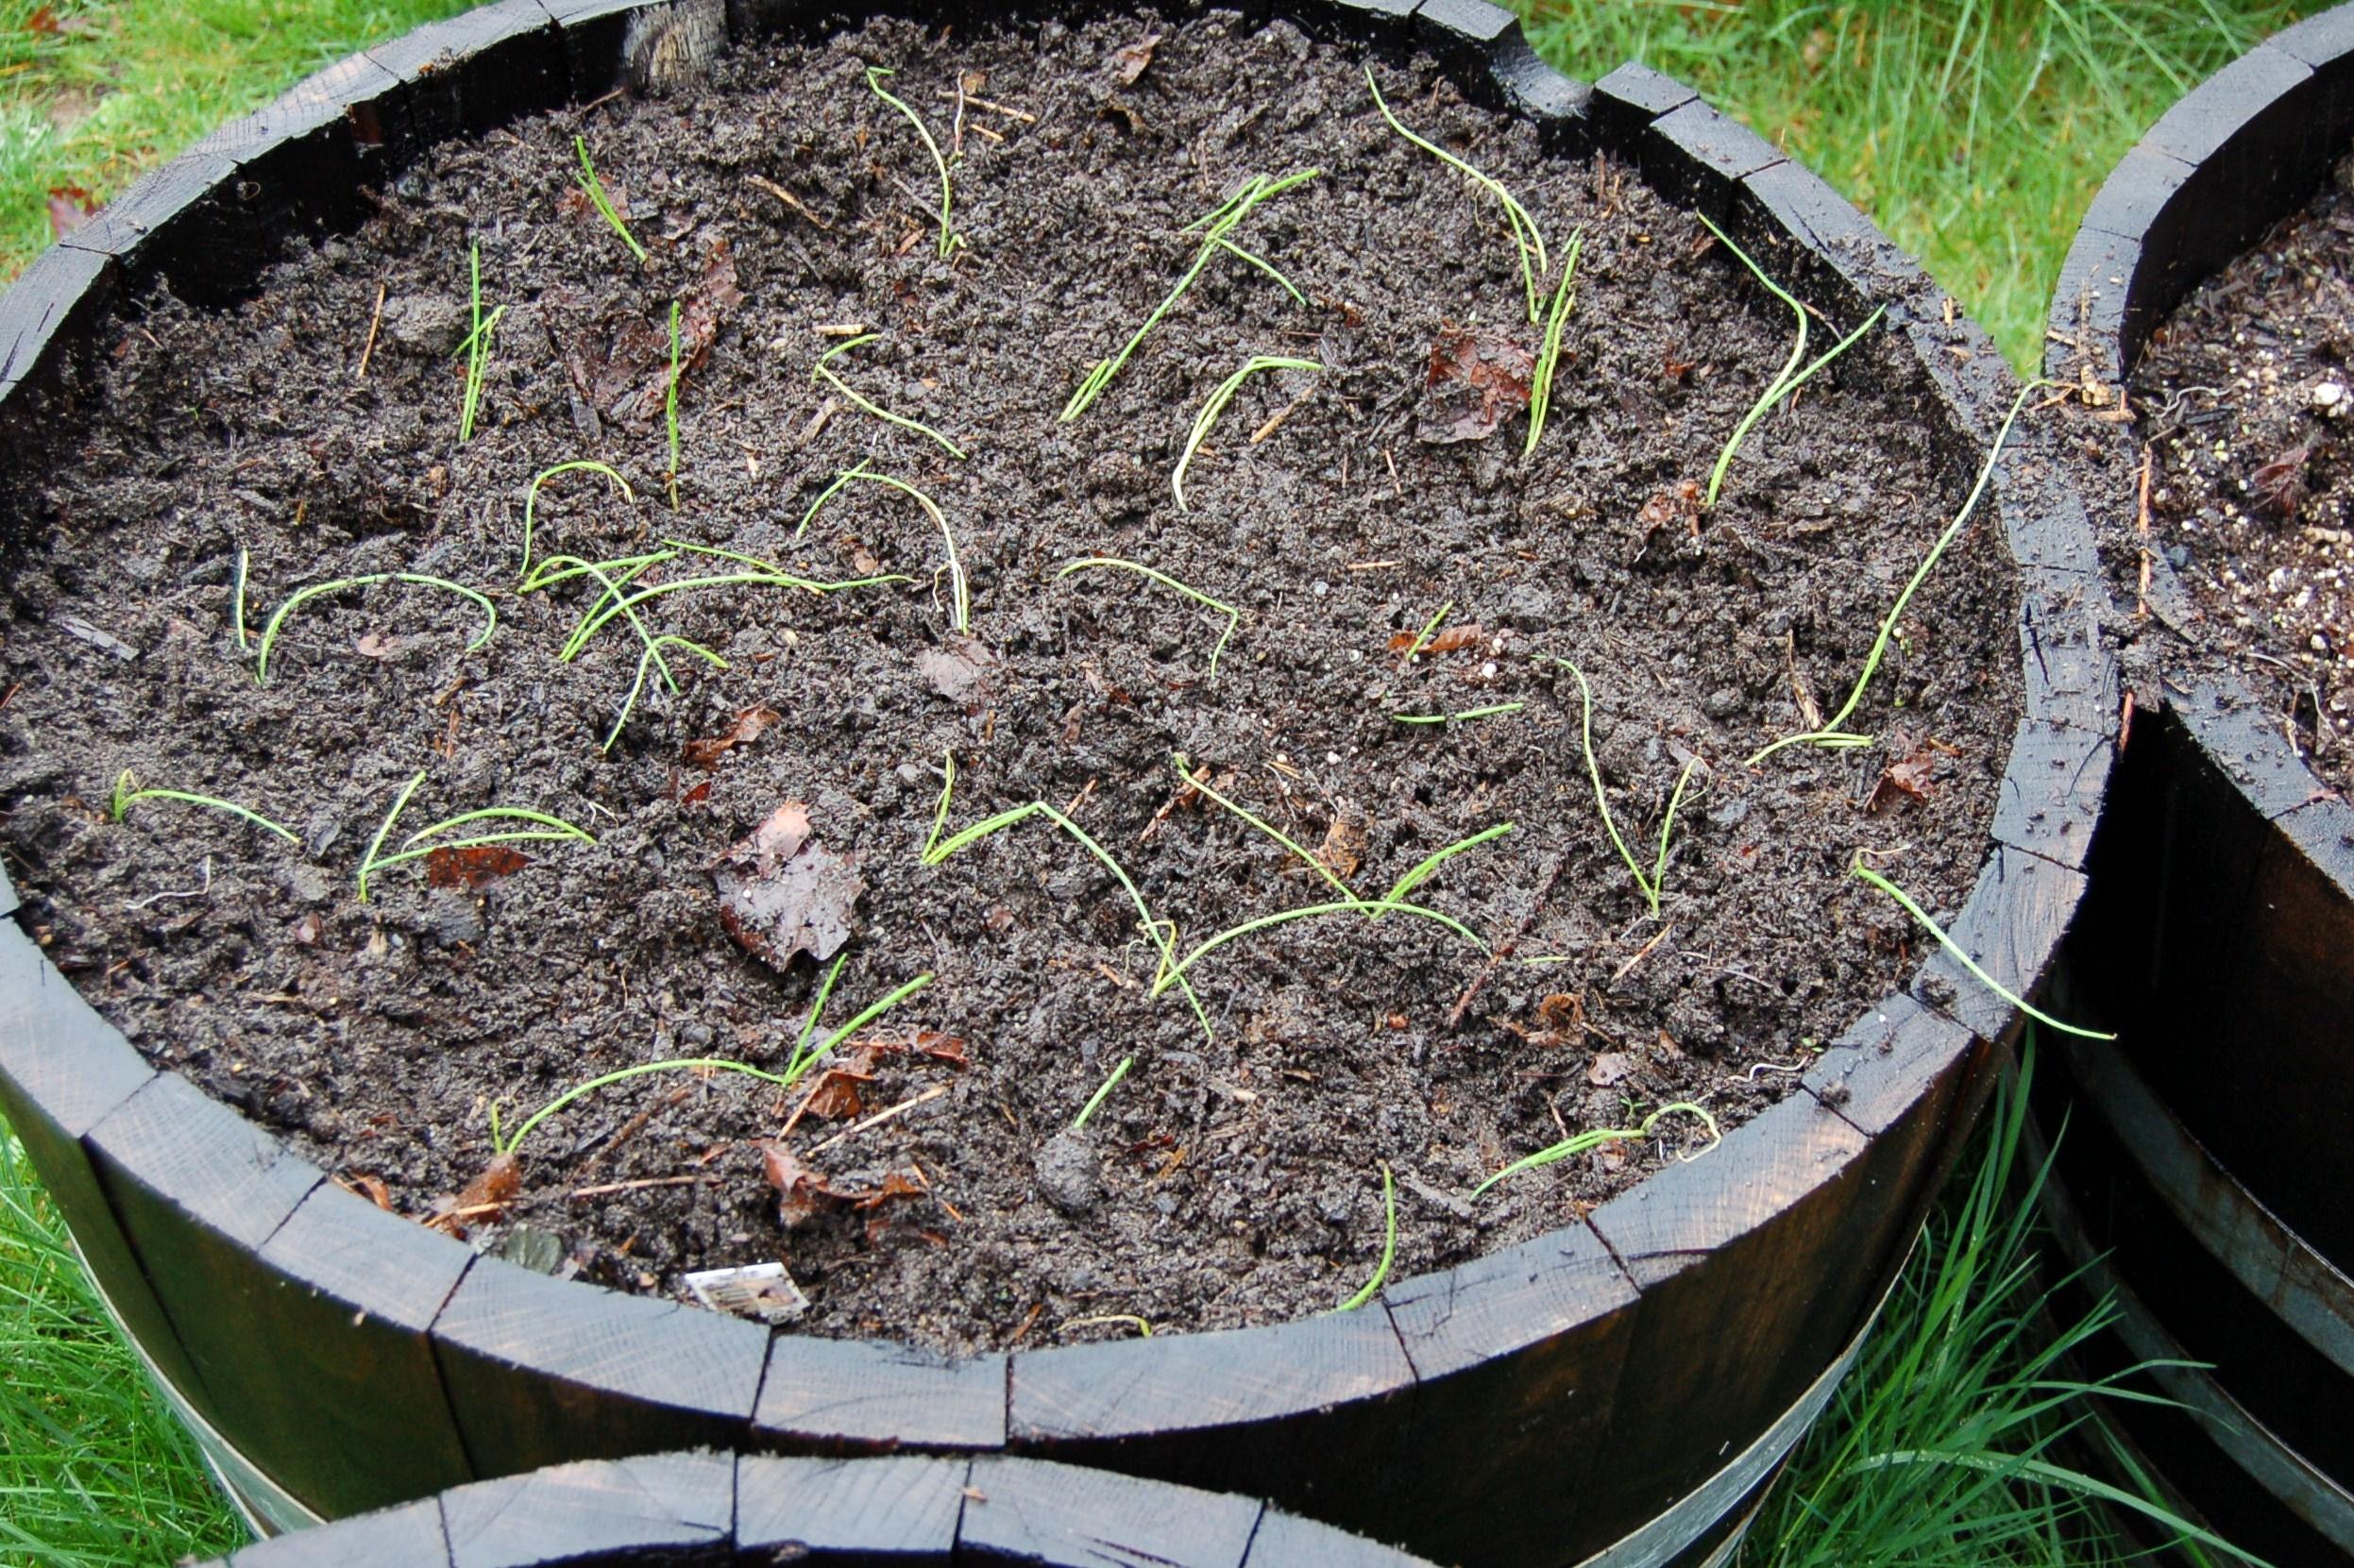 Walla Walla onions in a half wine barrel